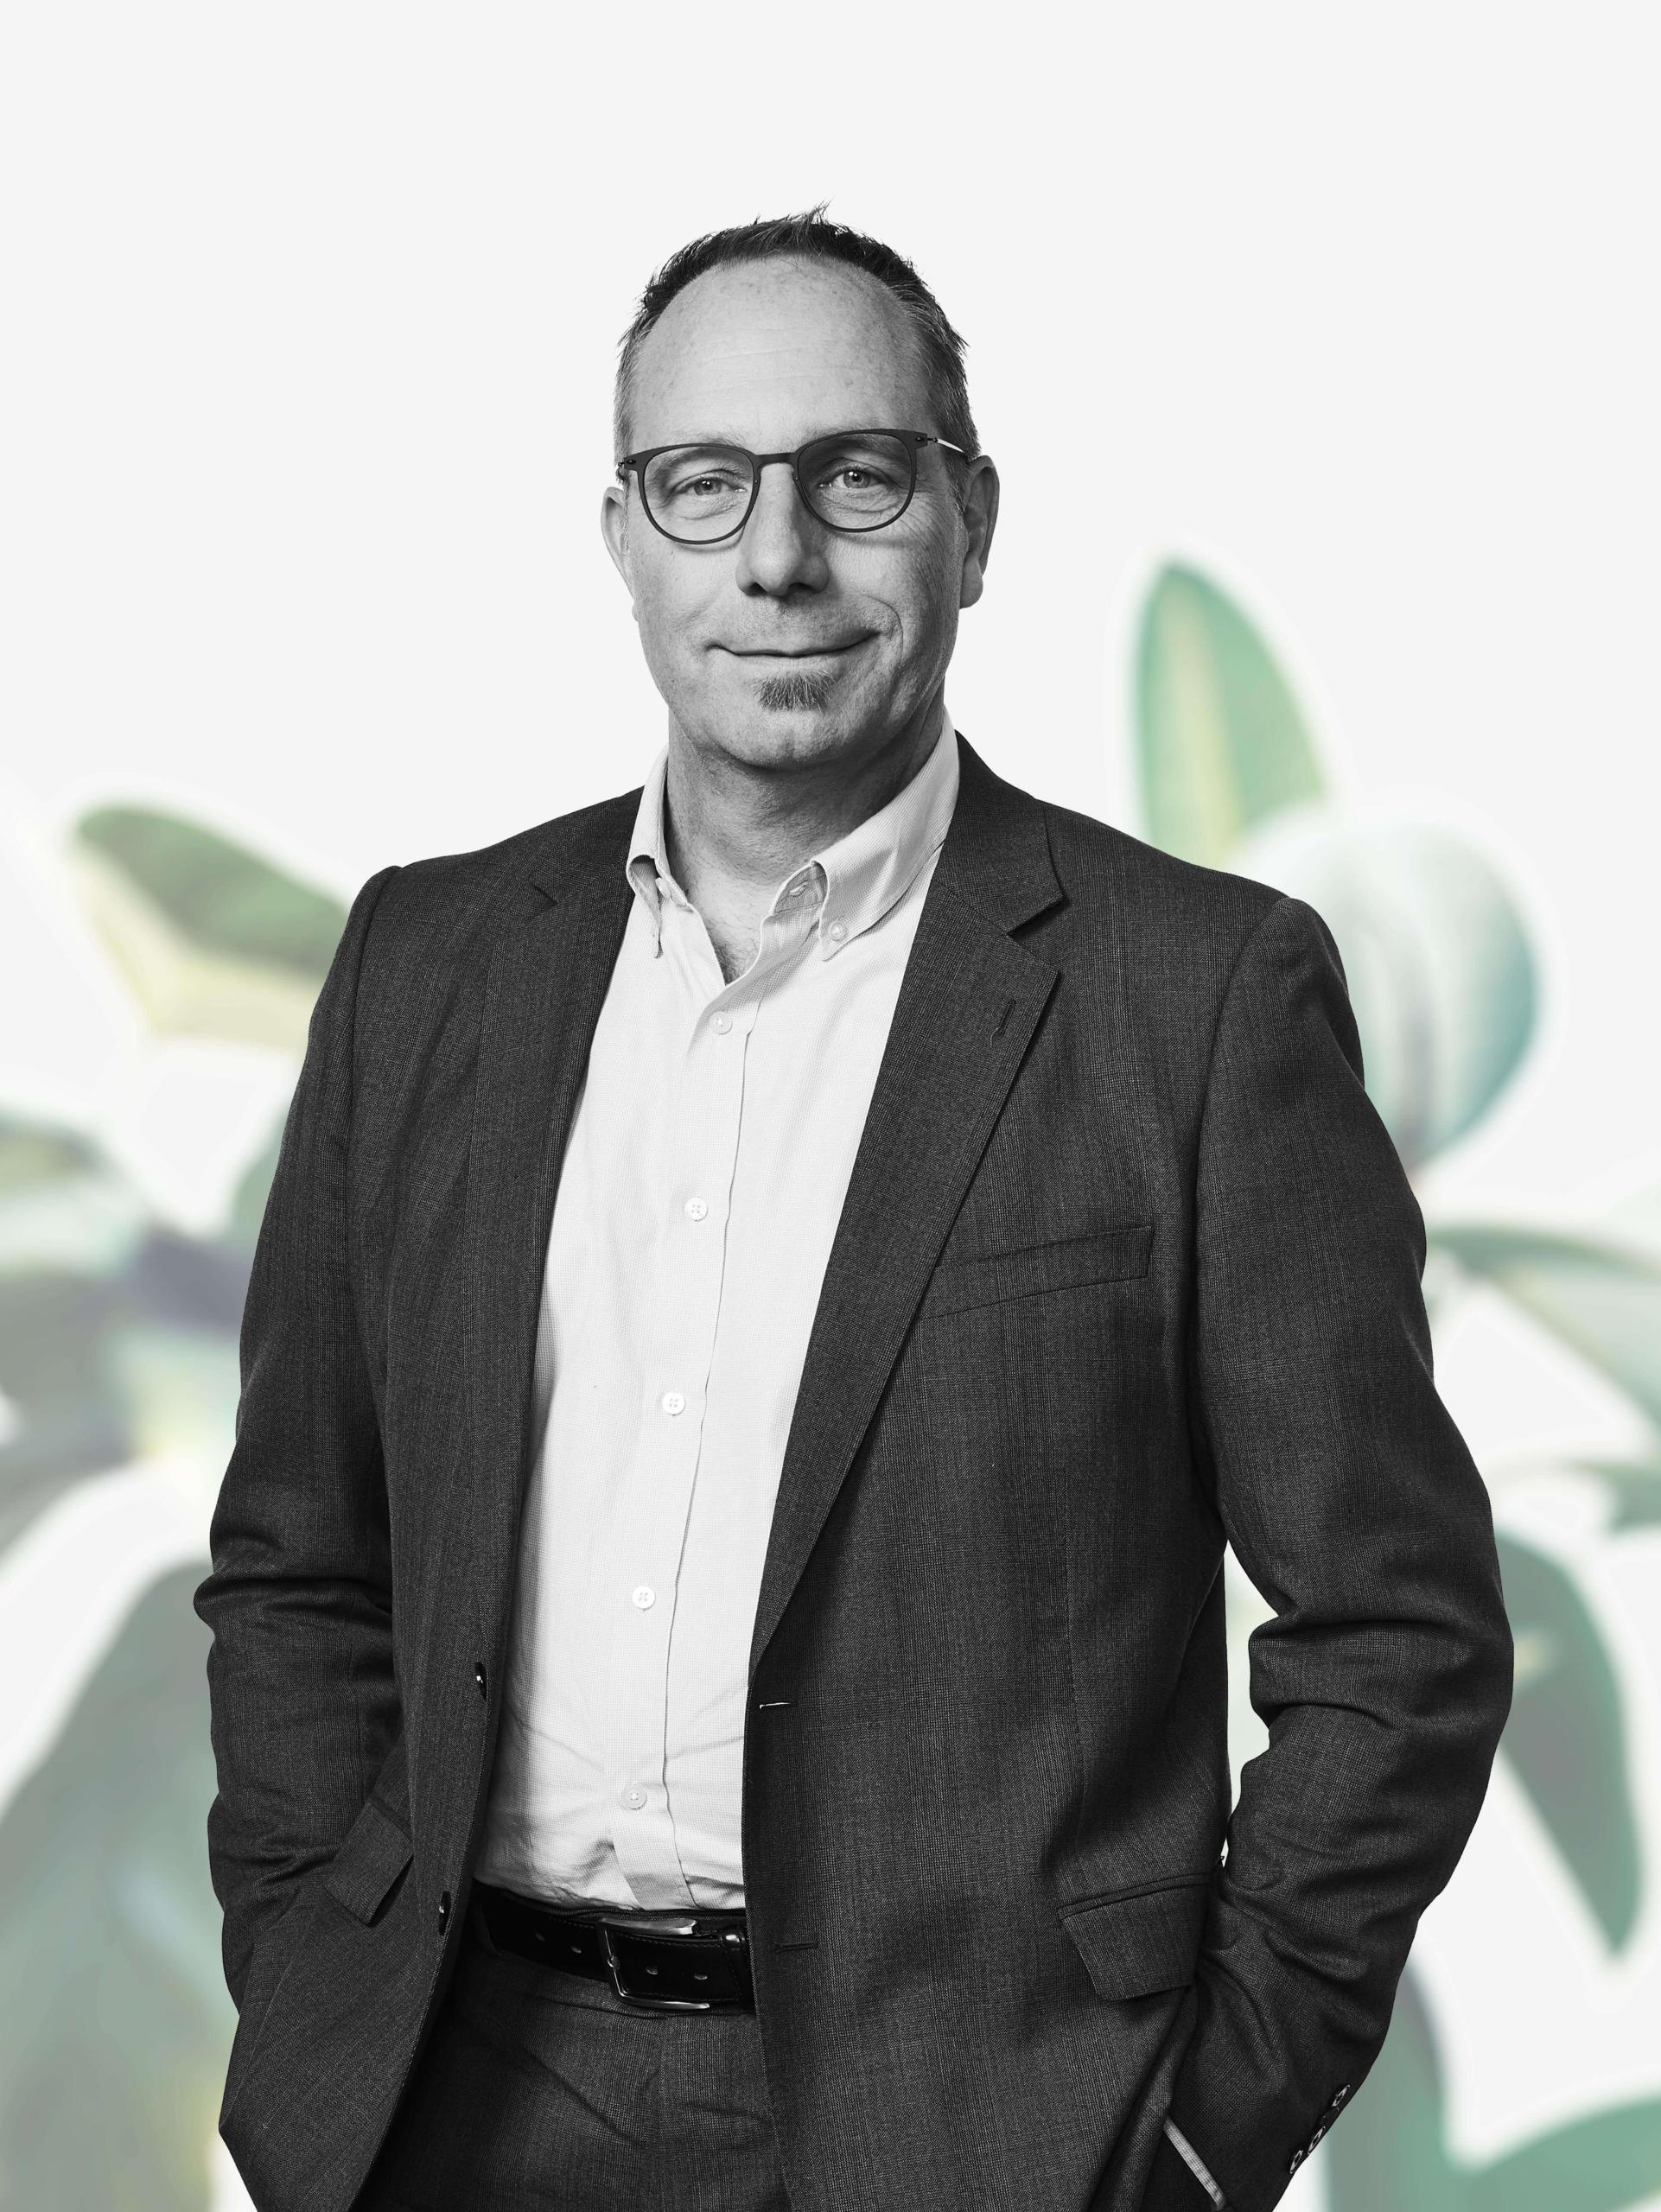 Carsten Schopp - Geschäftsführer bei Krause&Schopp